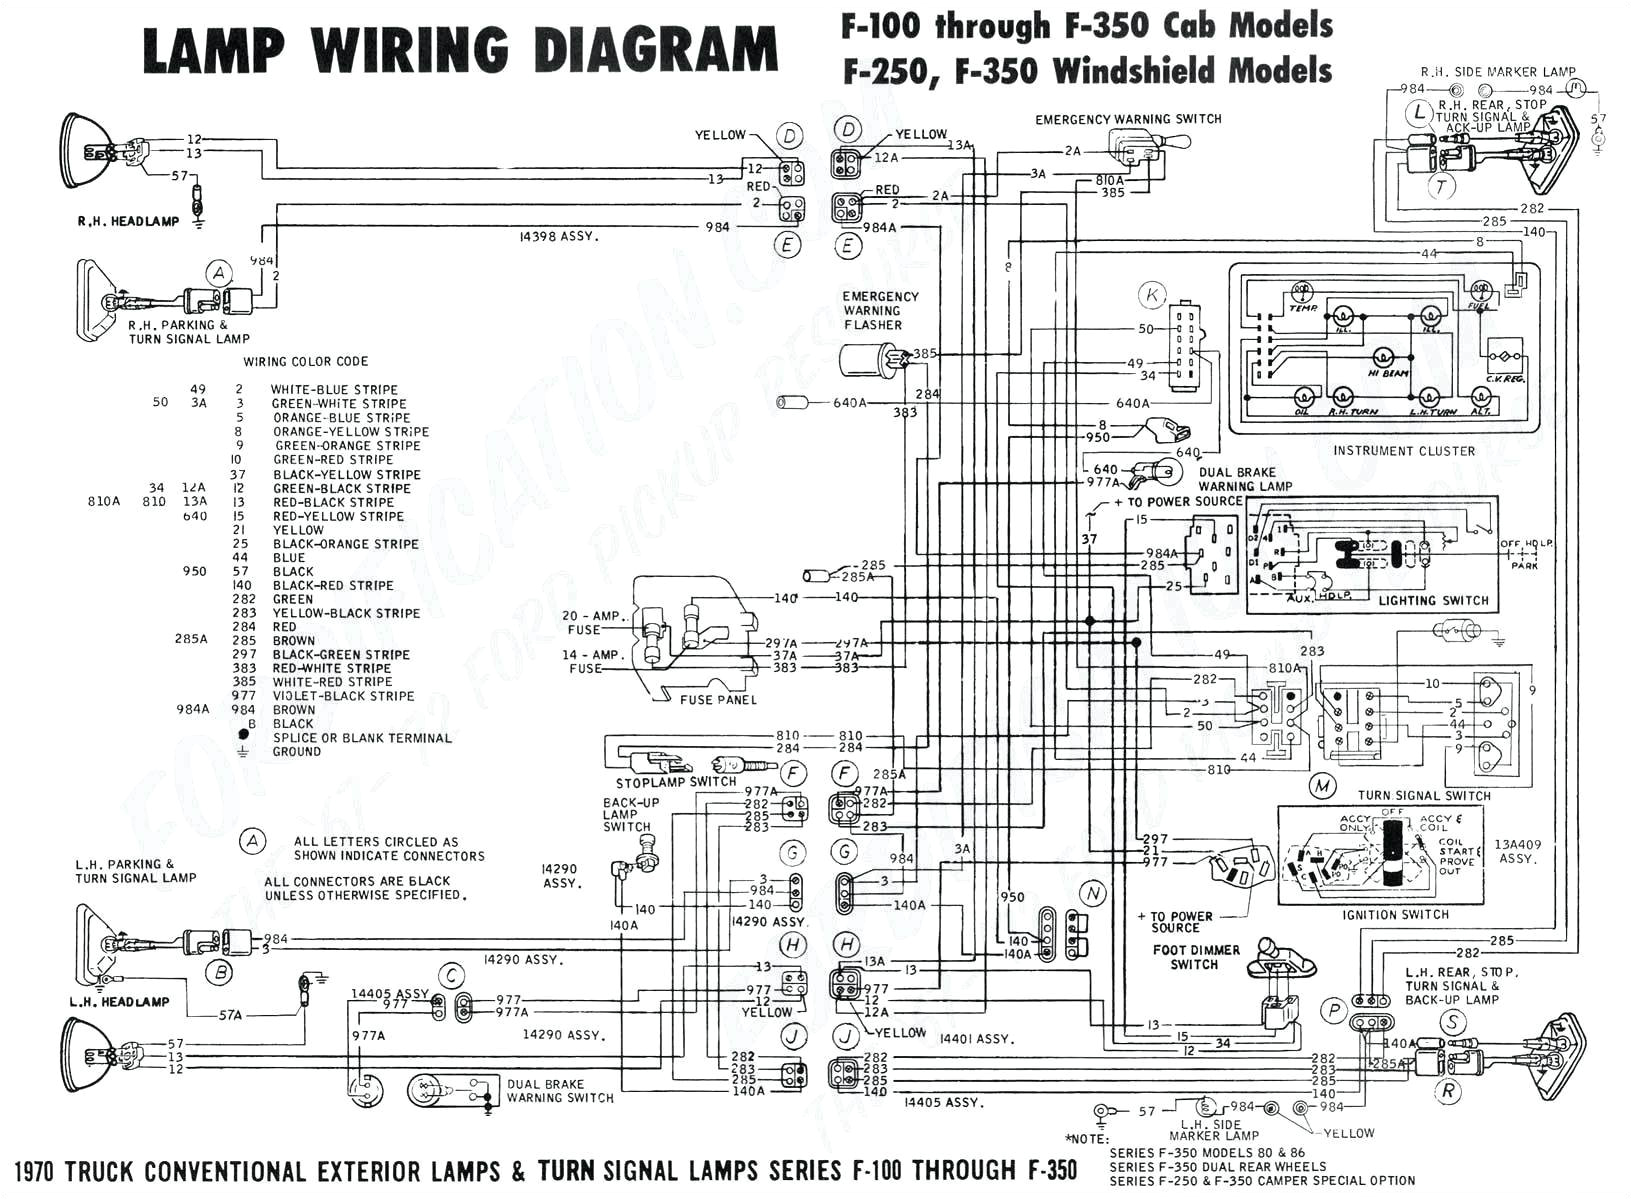 1975 ford wiring diagram origin at f250 png